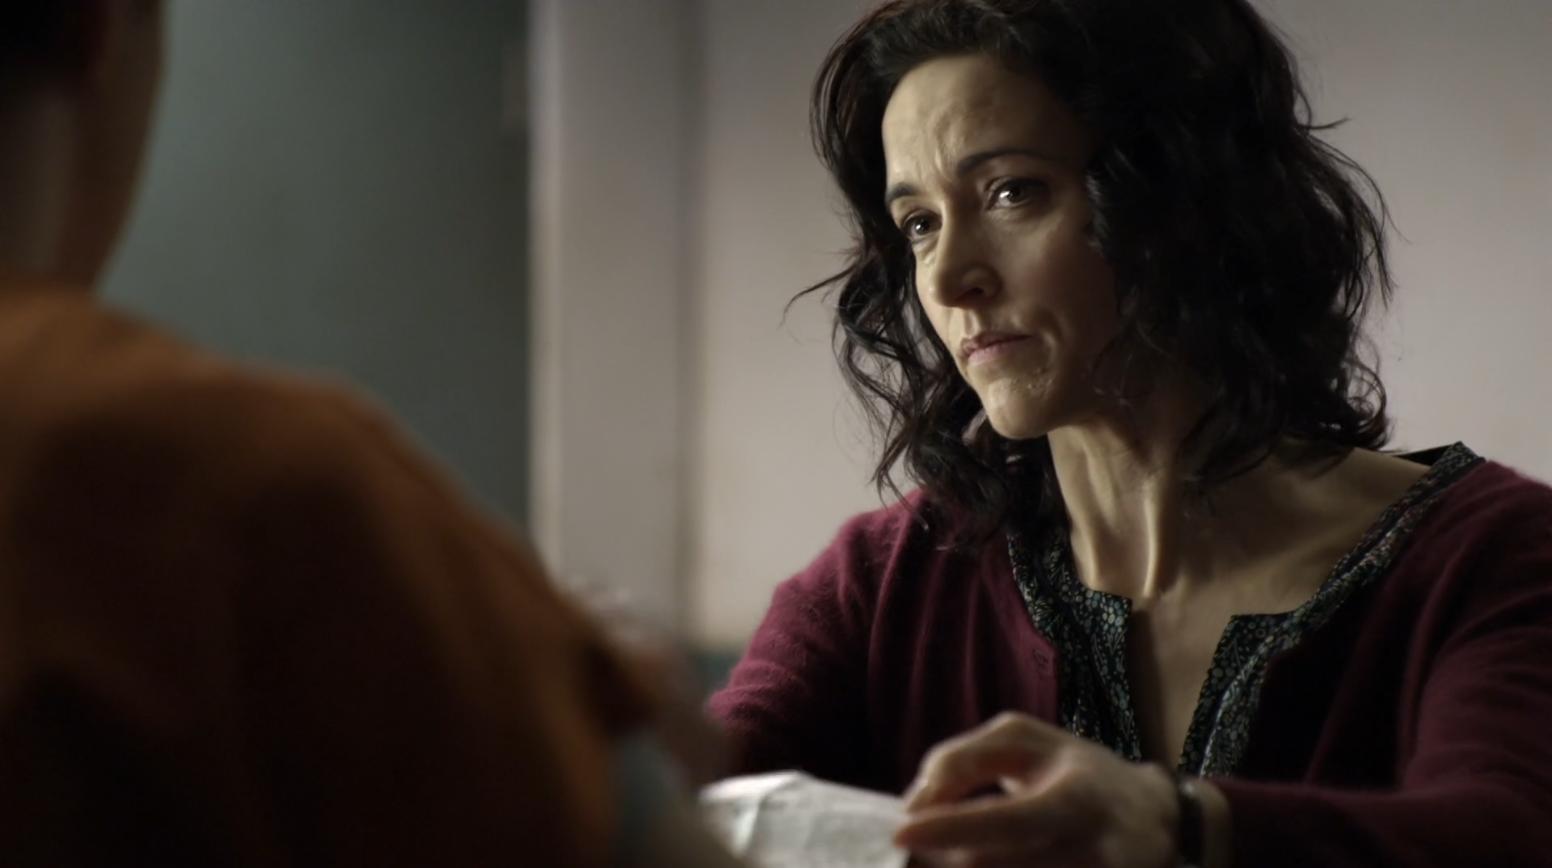 Janet Kidder as Ann Sadler - Continuum